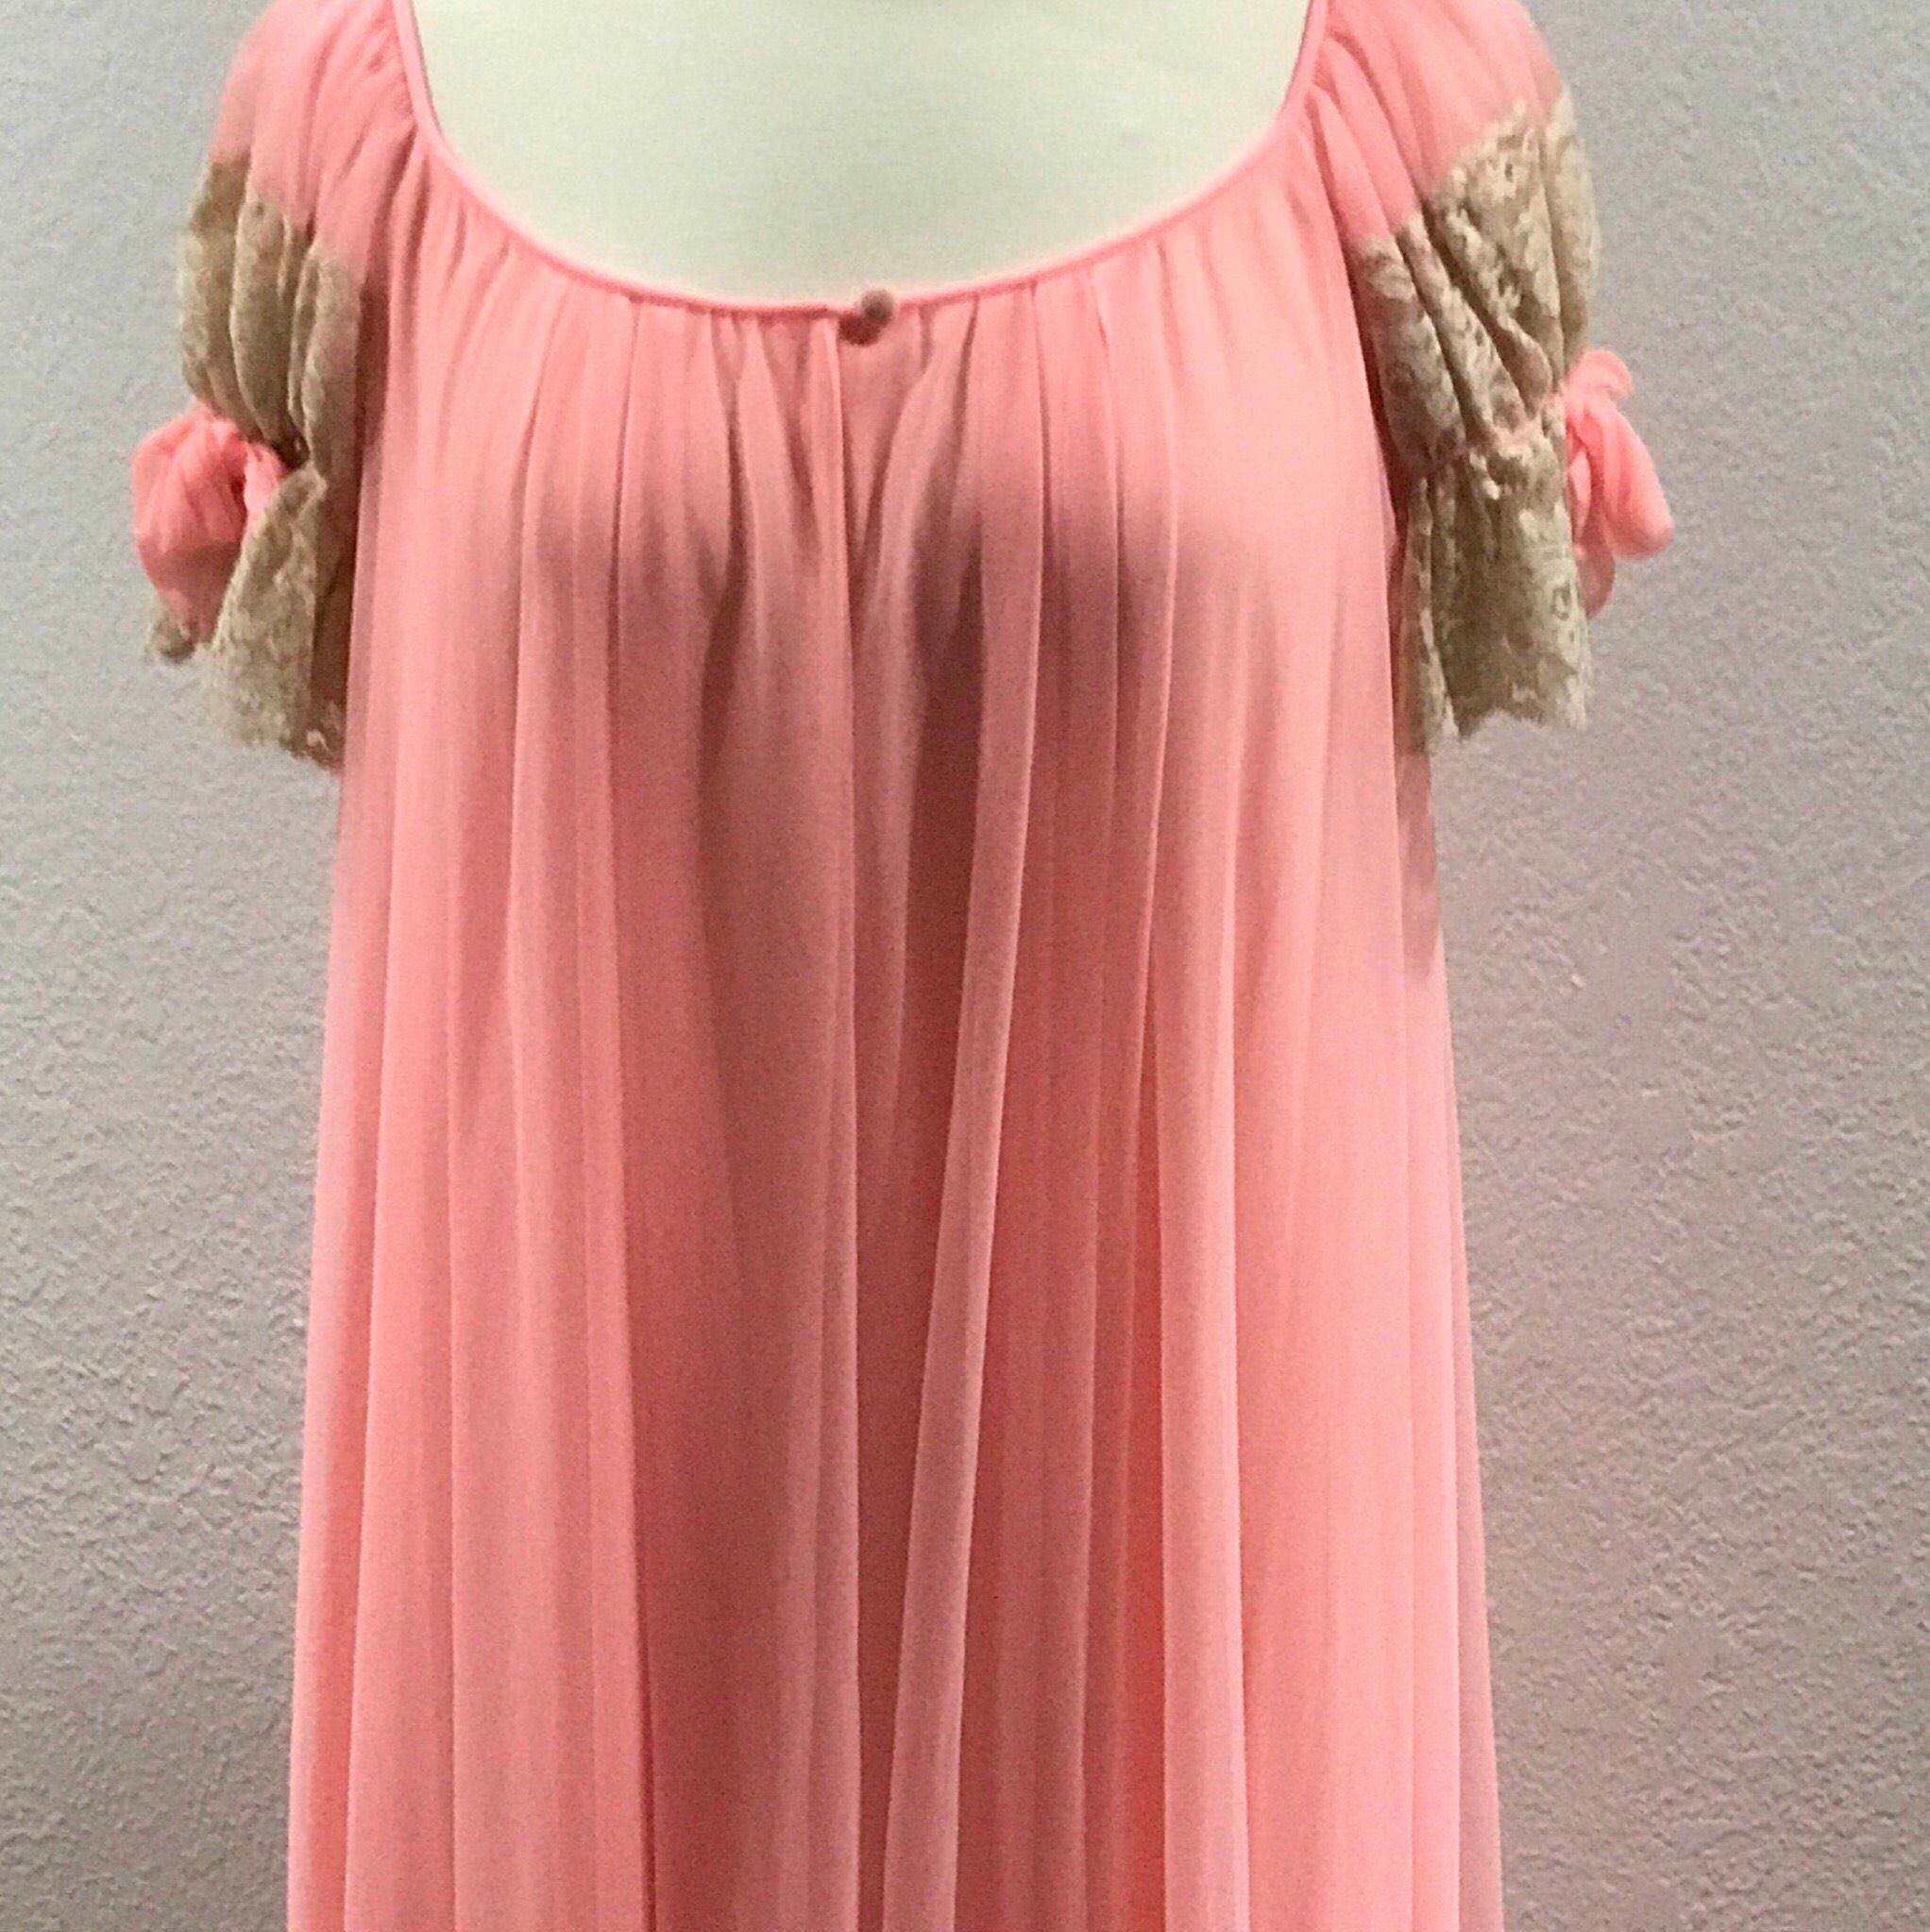 Lucie Ann Robe Pink Chiffon by Claire Sandra 485110b93